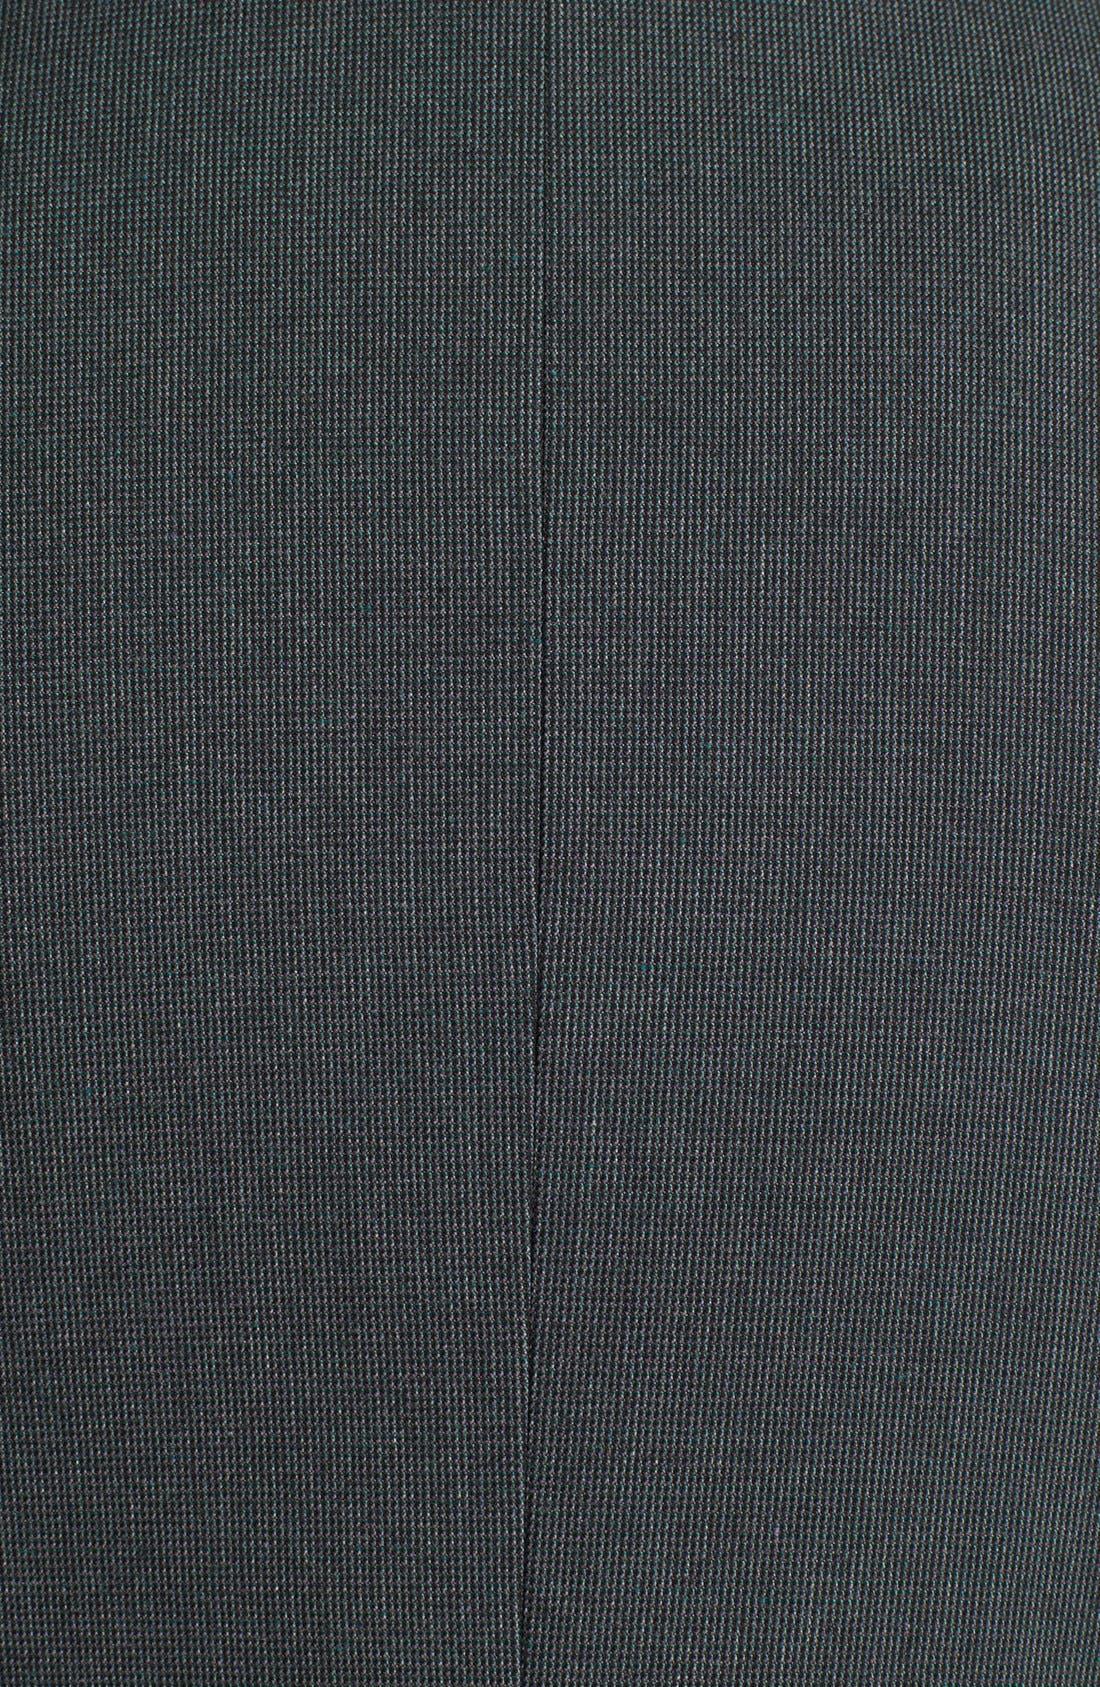 Alternate Image 3  - Halogen® 'Fox Hunt' Suit Jacket (Regular & Petite)